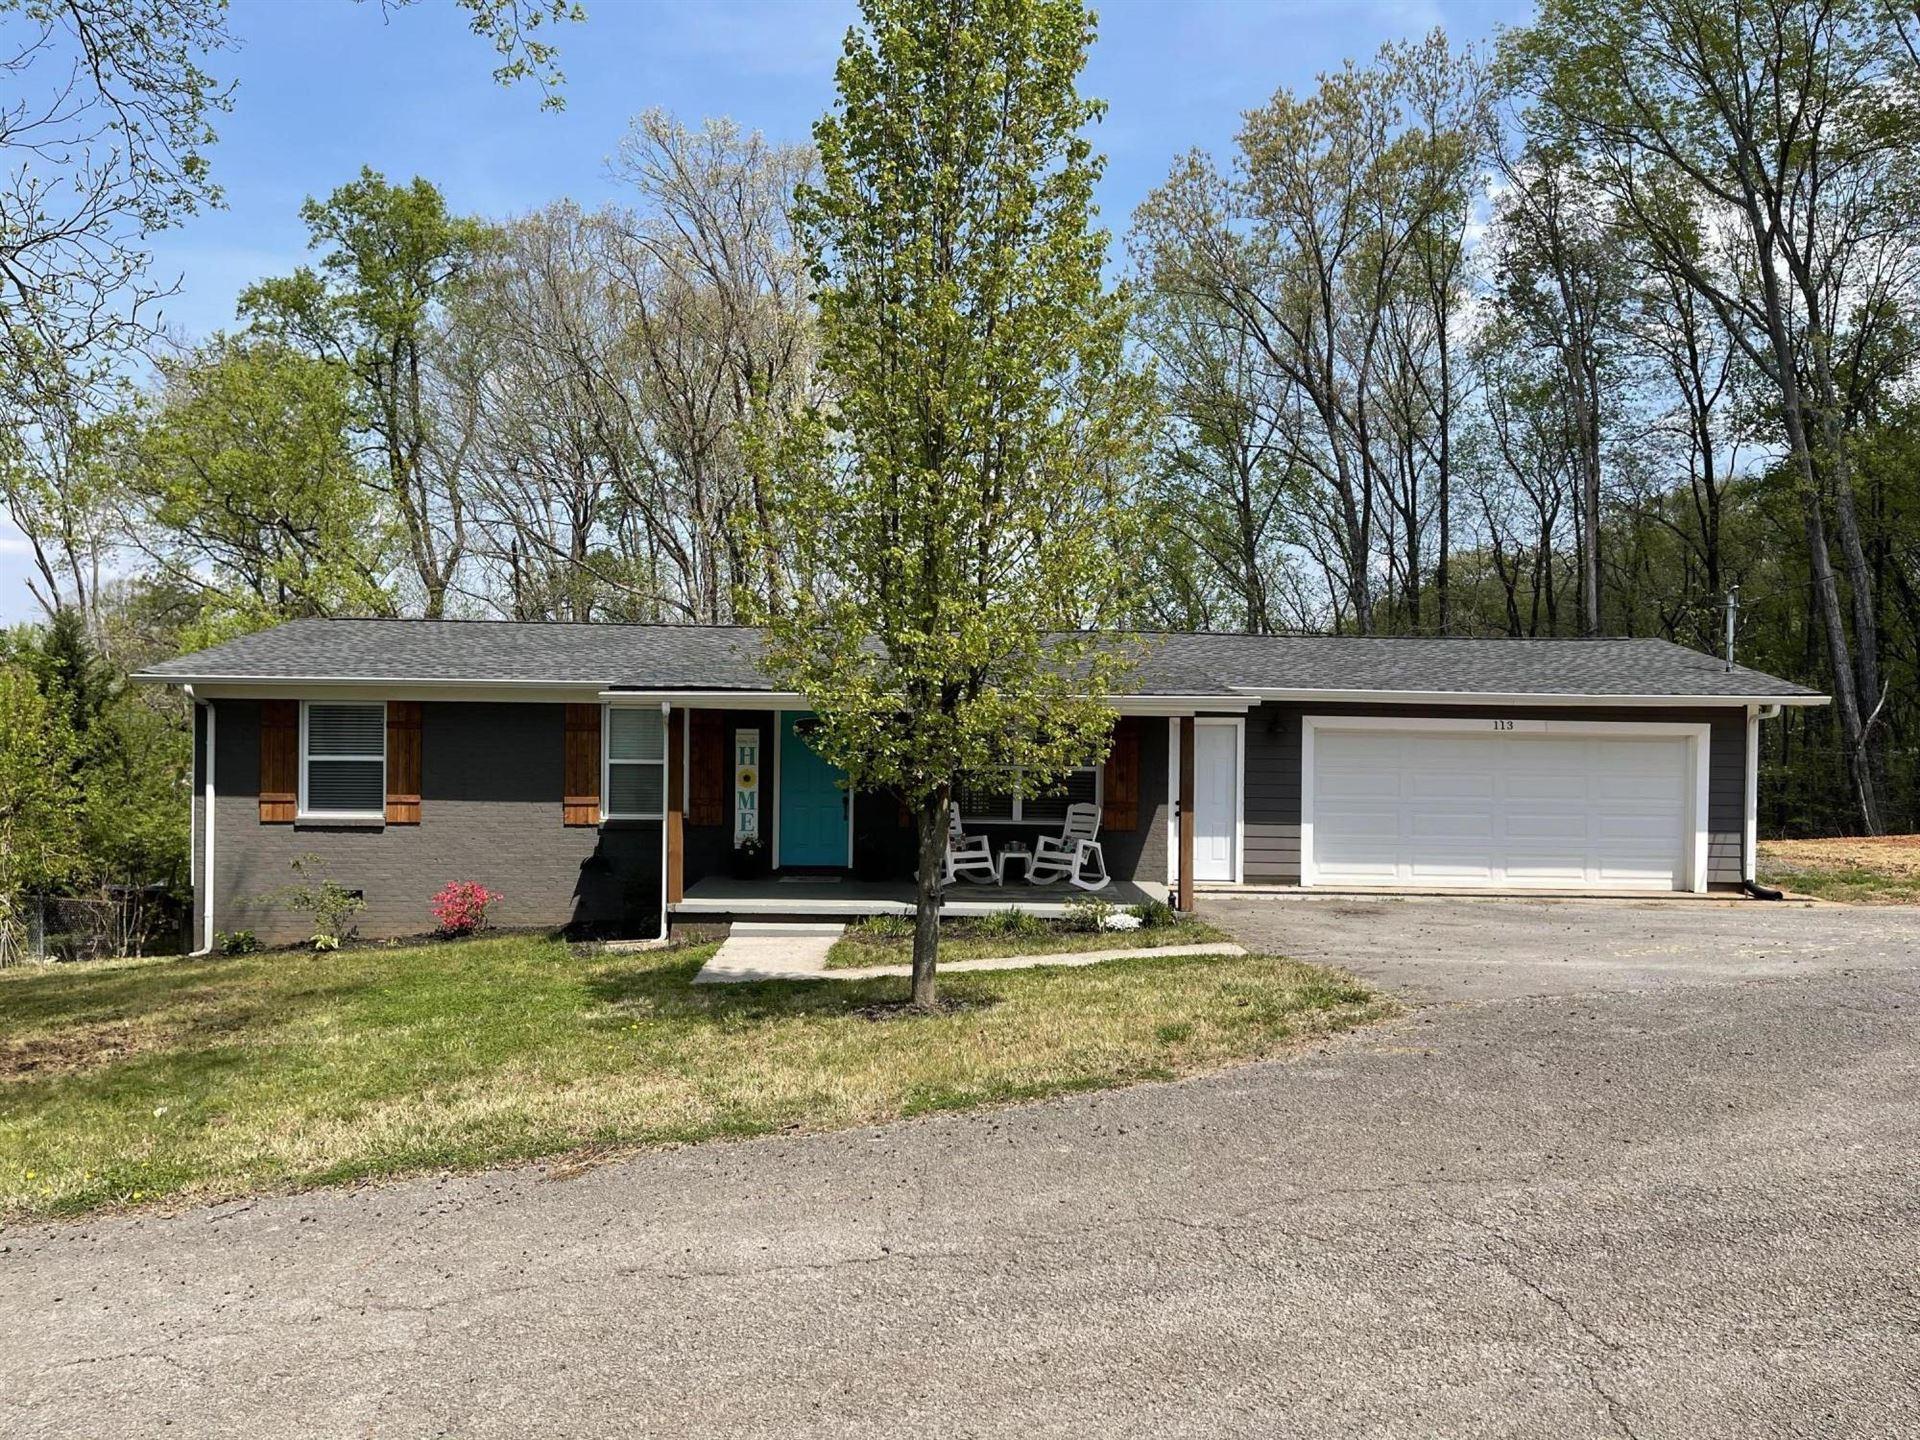 Photo of 113 Cuddie Lane, Loudon, TN 37774 (MLS # 1148784)